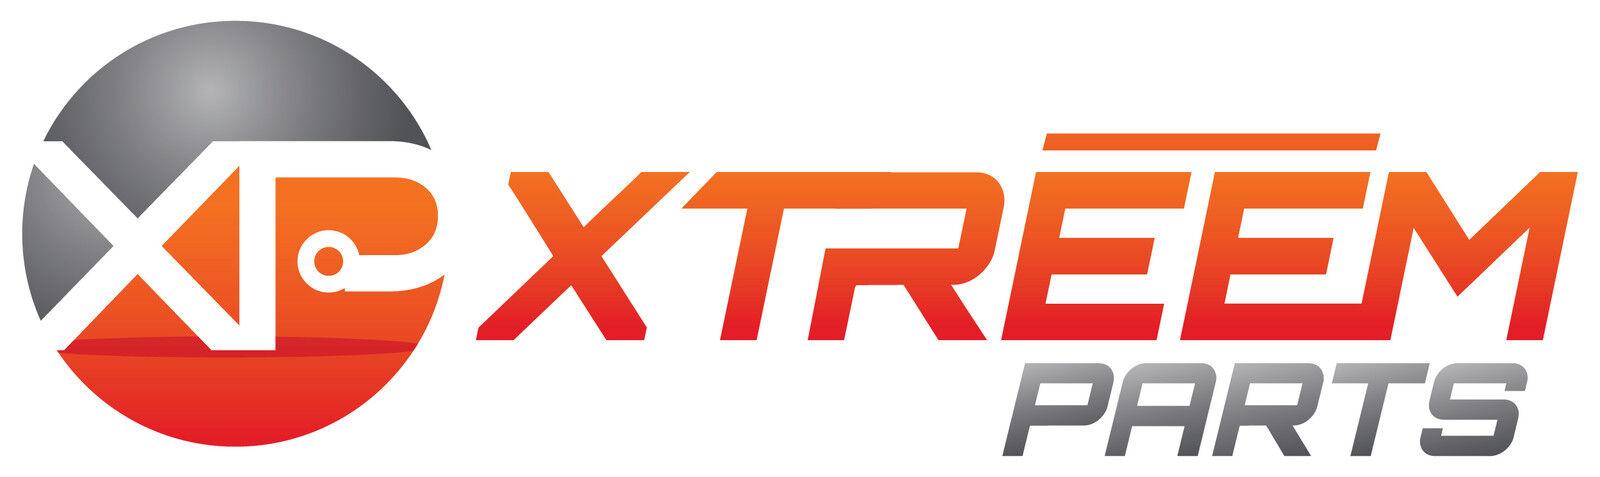 Xtreem Parts